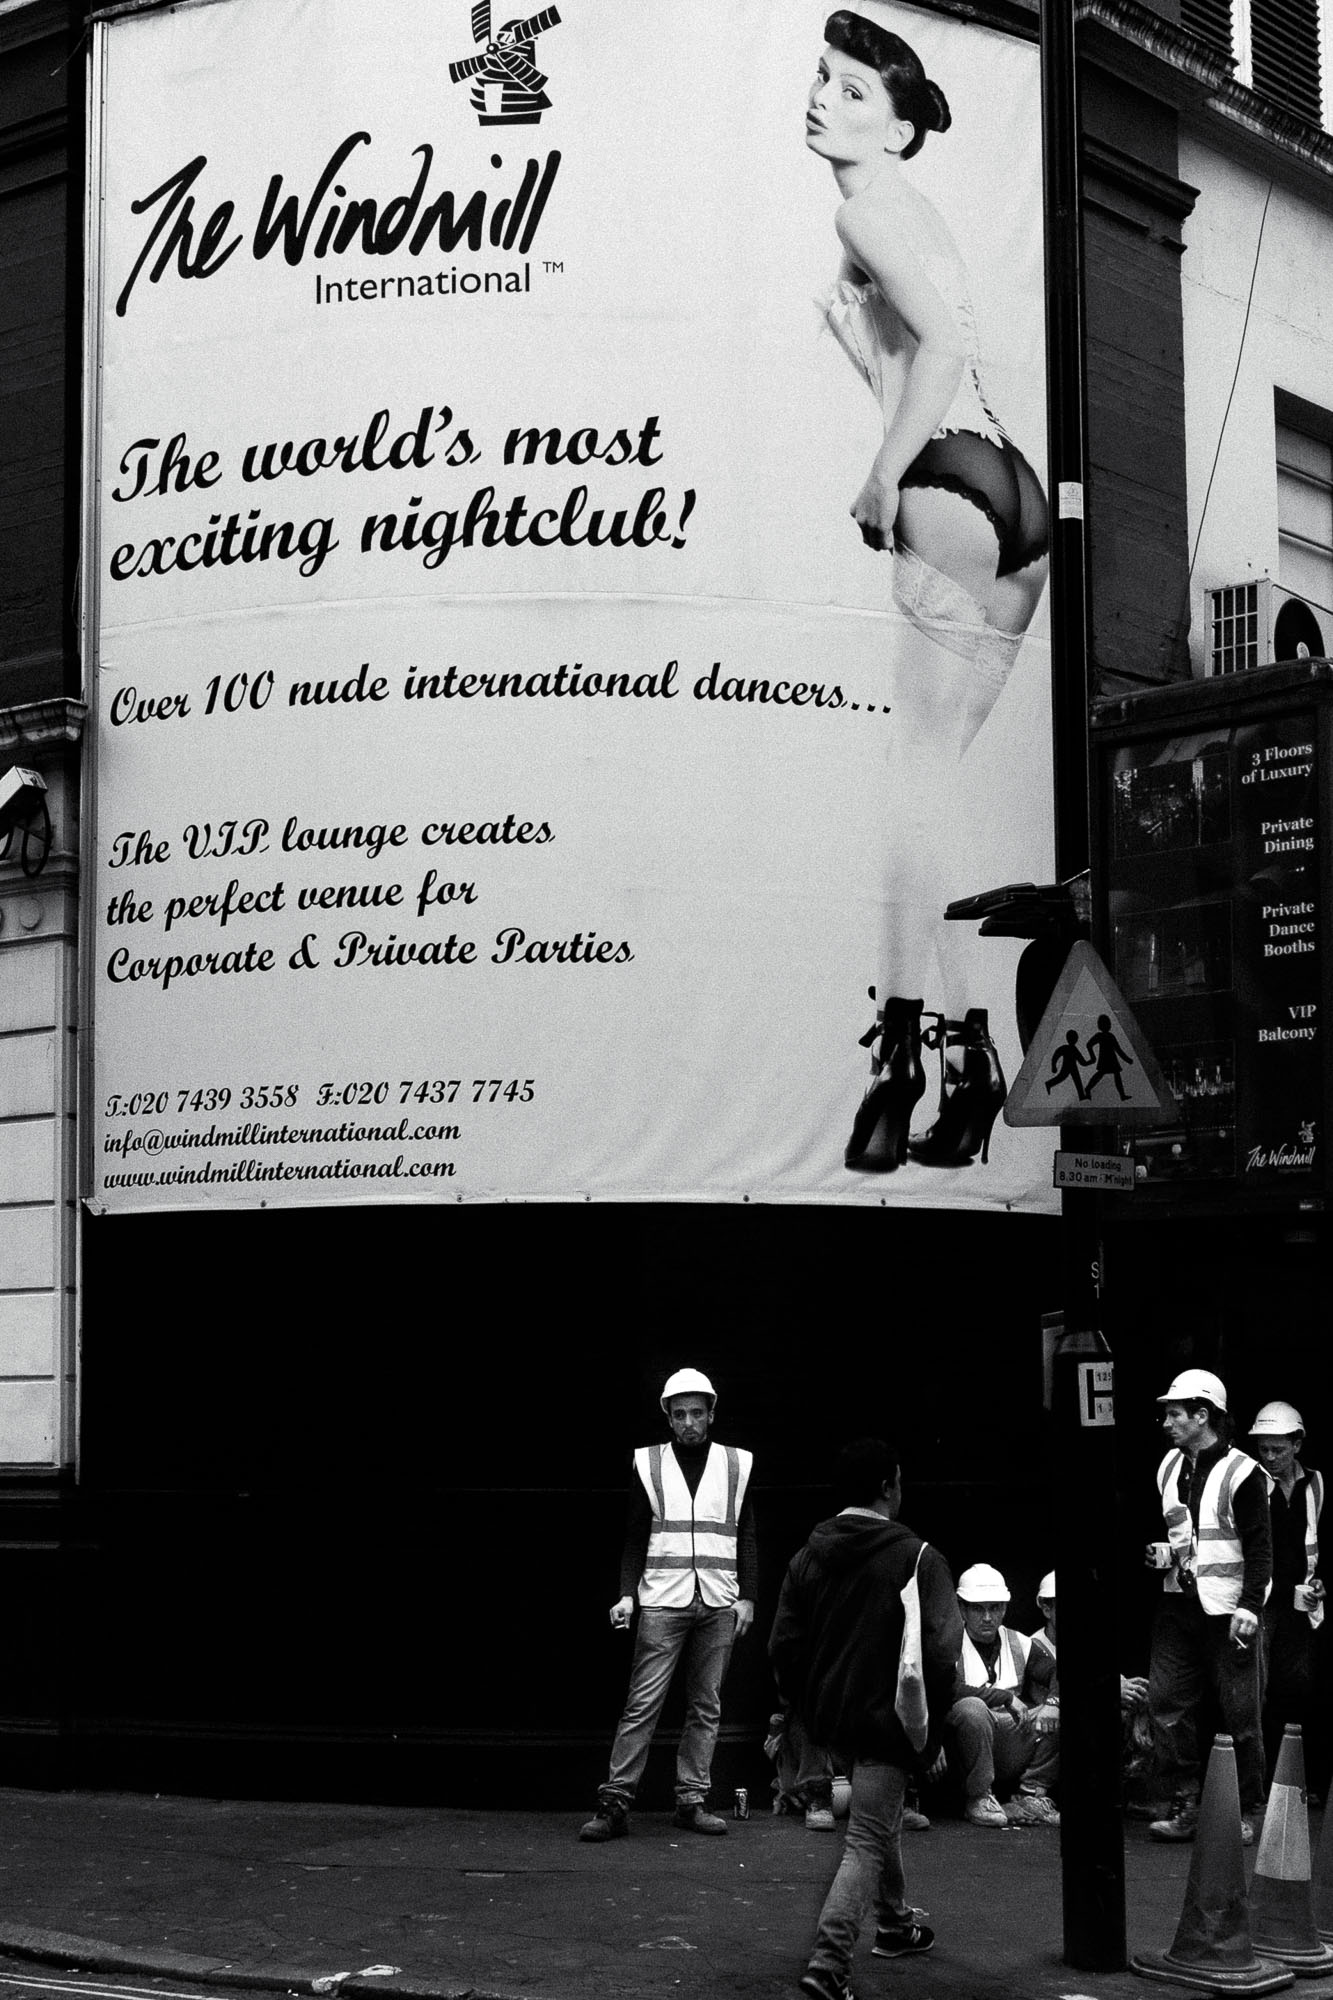 Sven-Michael---S-2014--6-[working-streets]---©-Sven-Michael-Golimowski.jpg